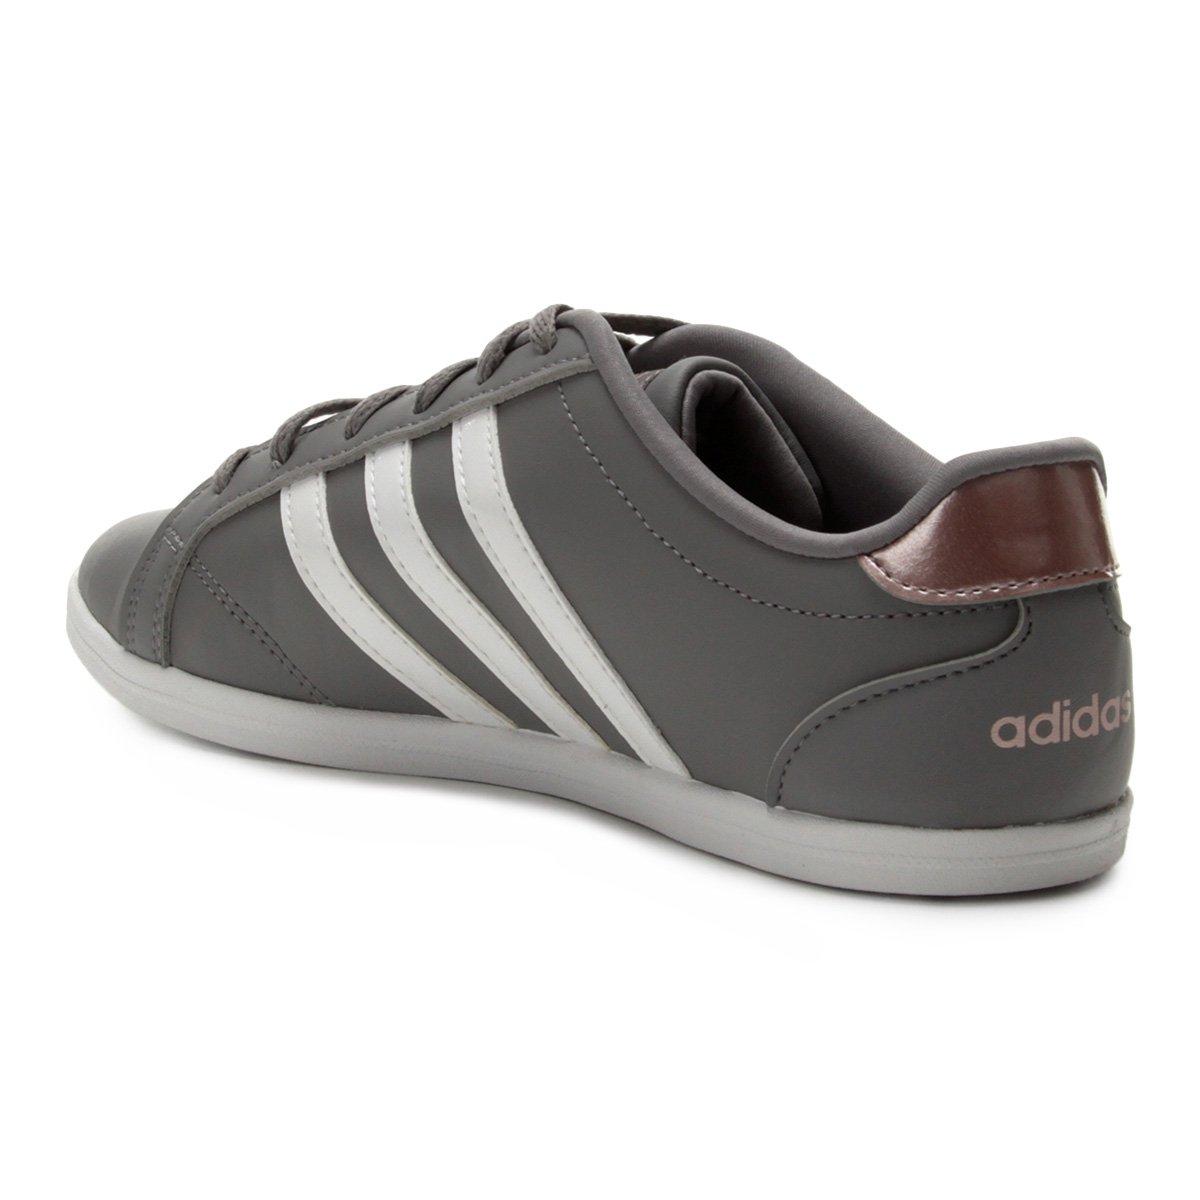 0c08800f0 Tênis Adidas VS Coneo QT Feminino | Opte+